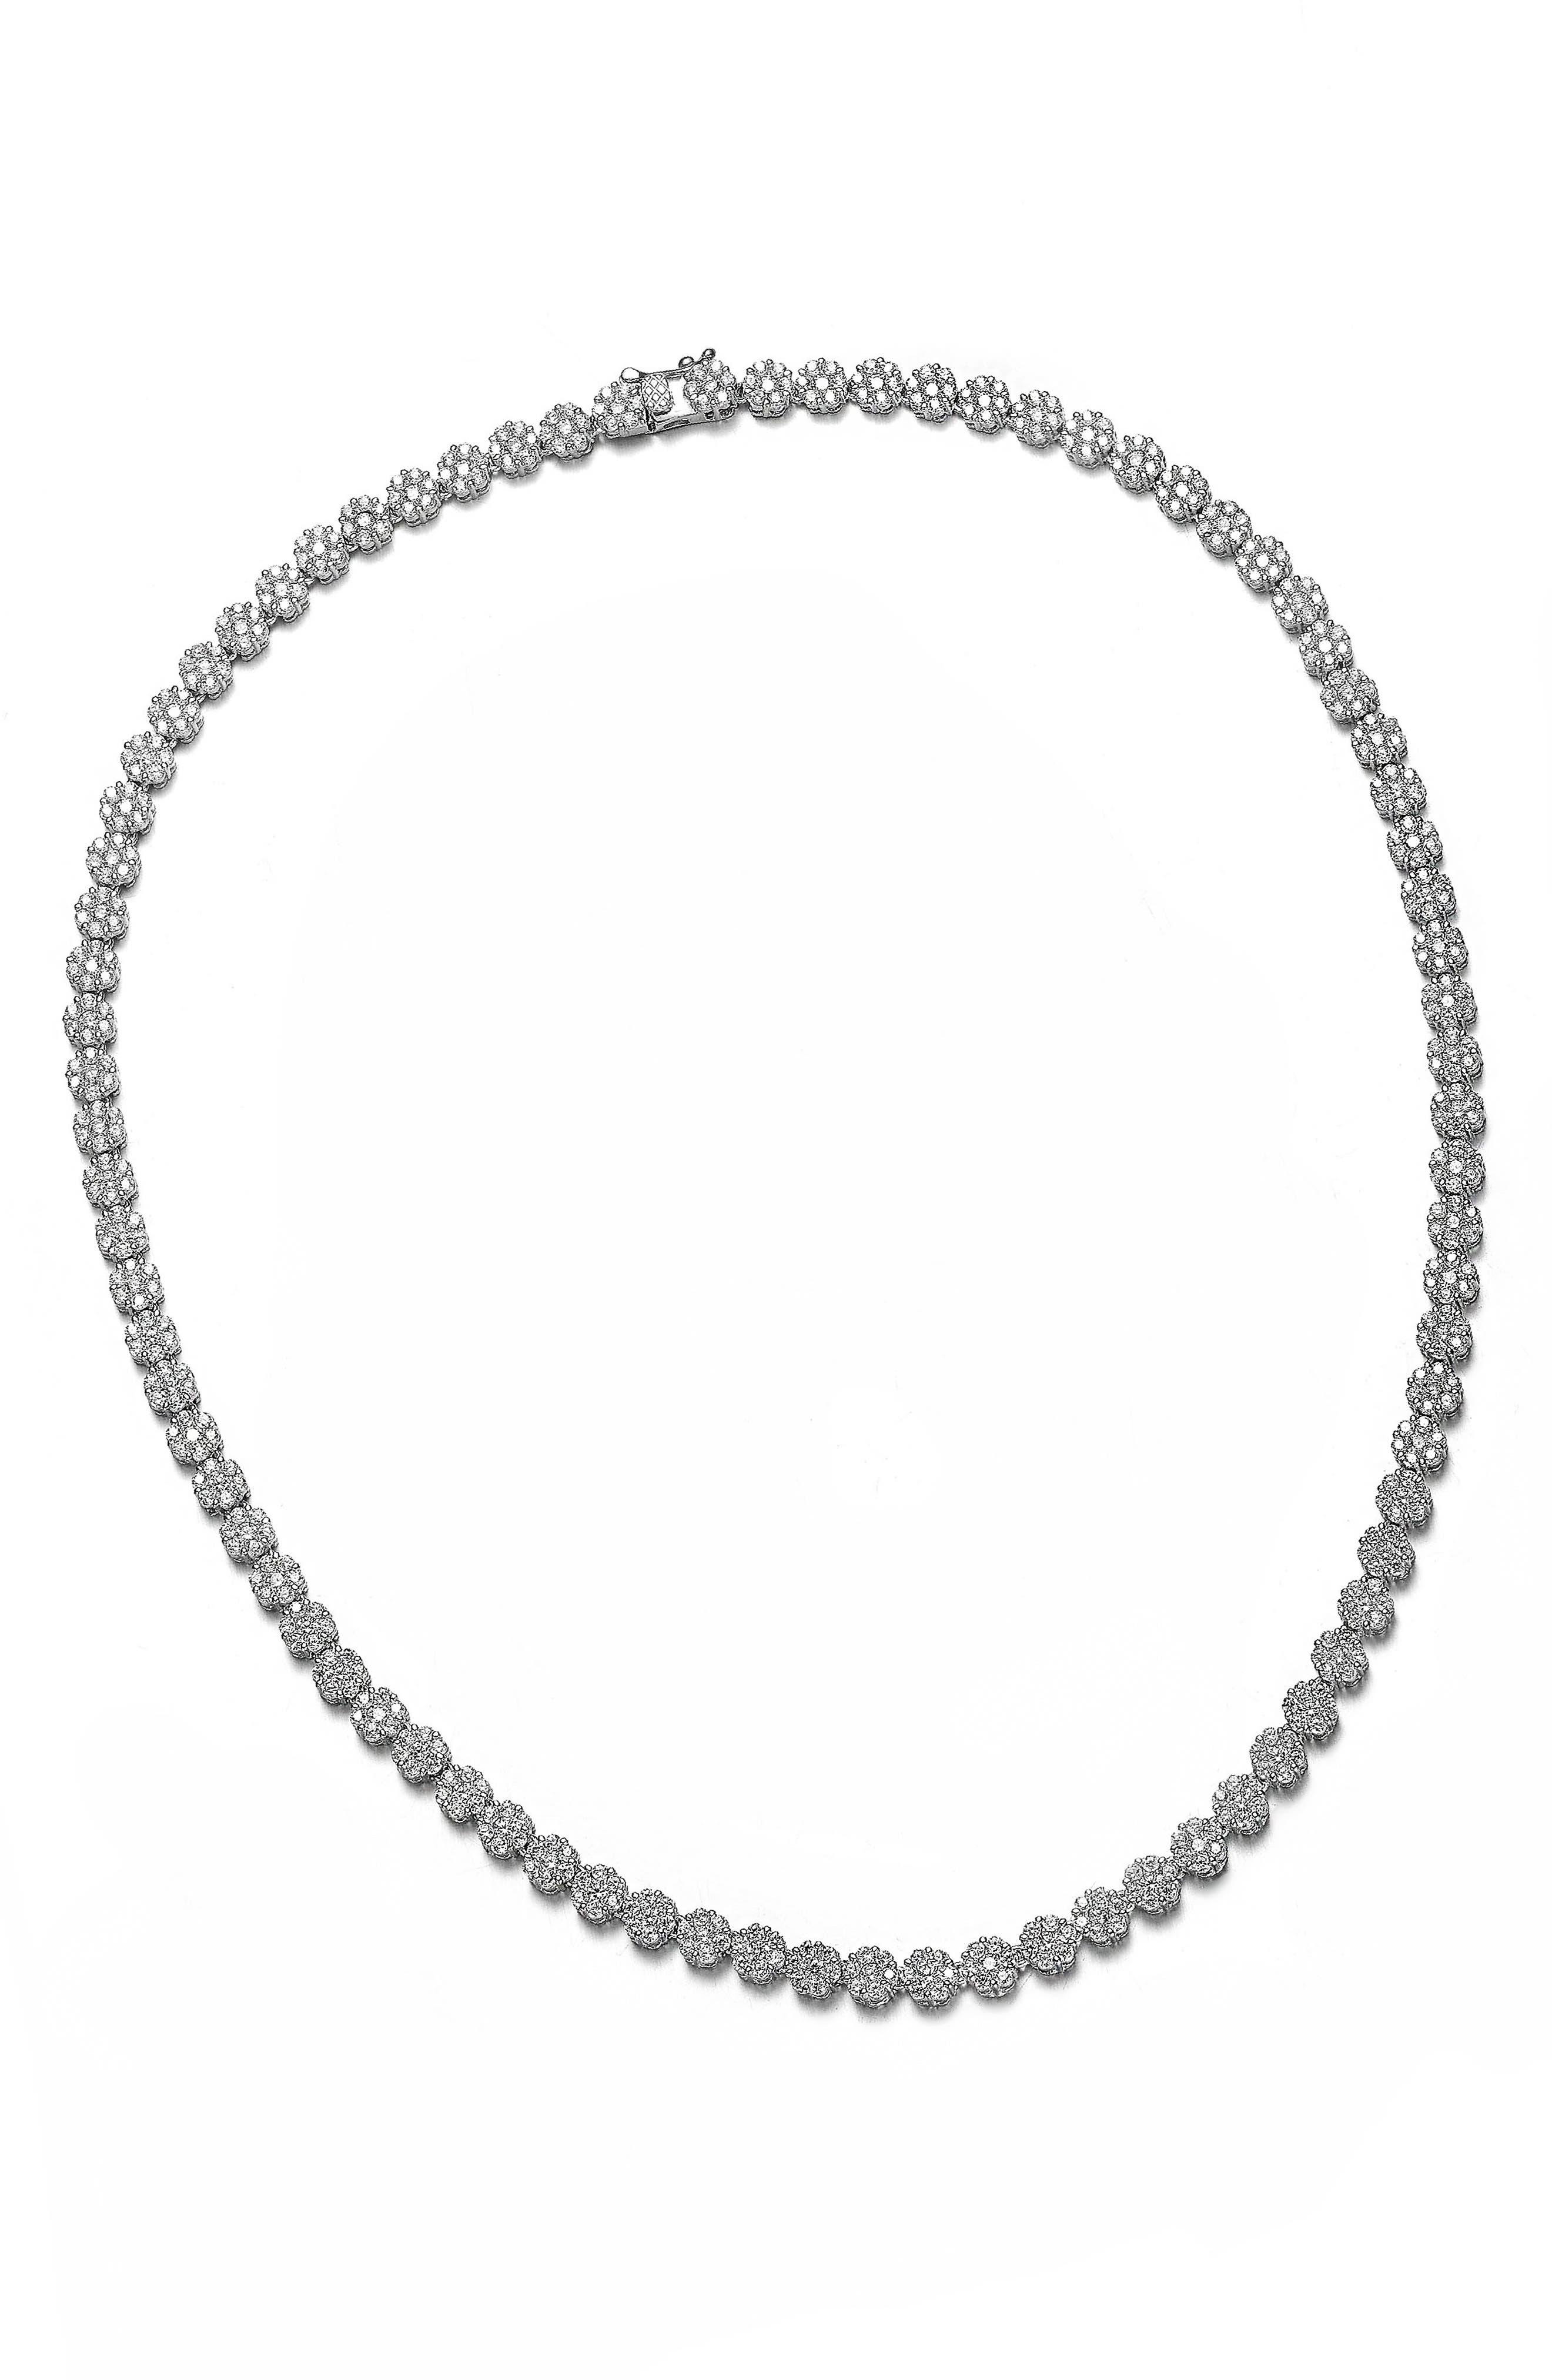 Cubic Zirconia Flower Tennis Necklace